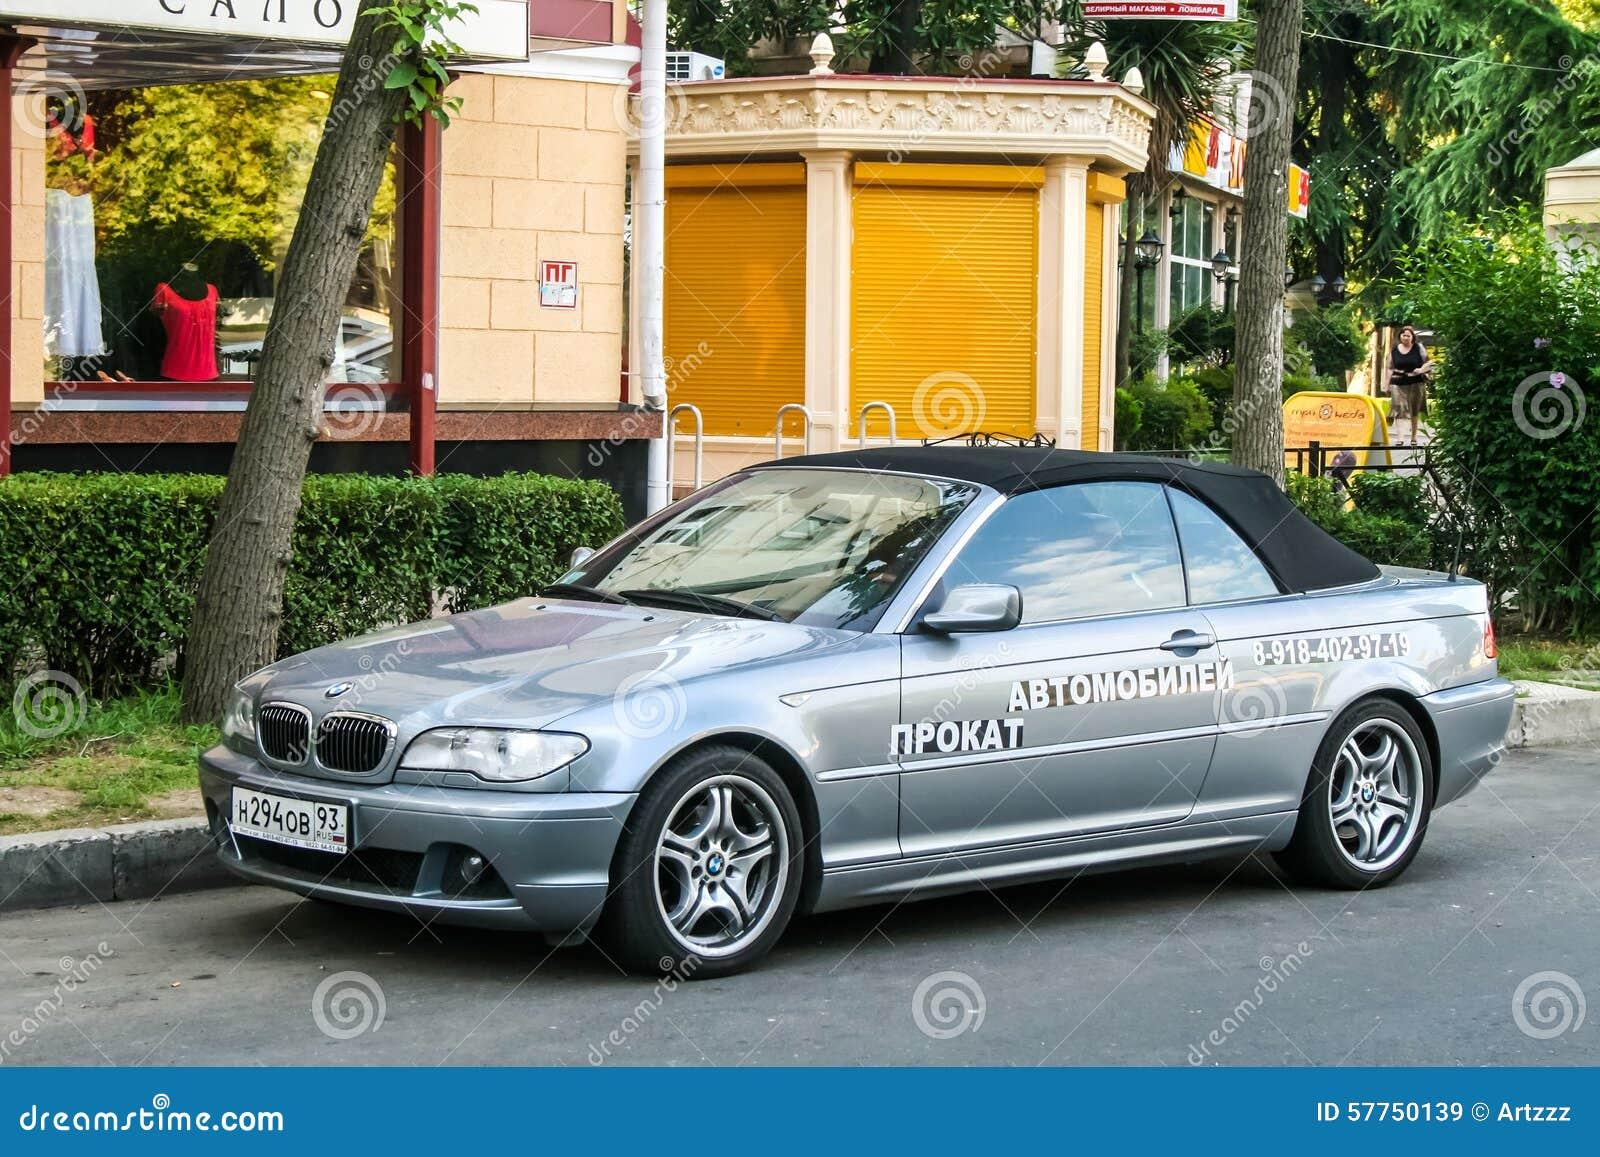 Bmw e46 3 series editorial photo 58356583 for Motor city auto sales